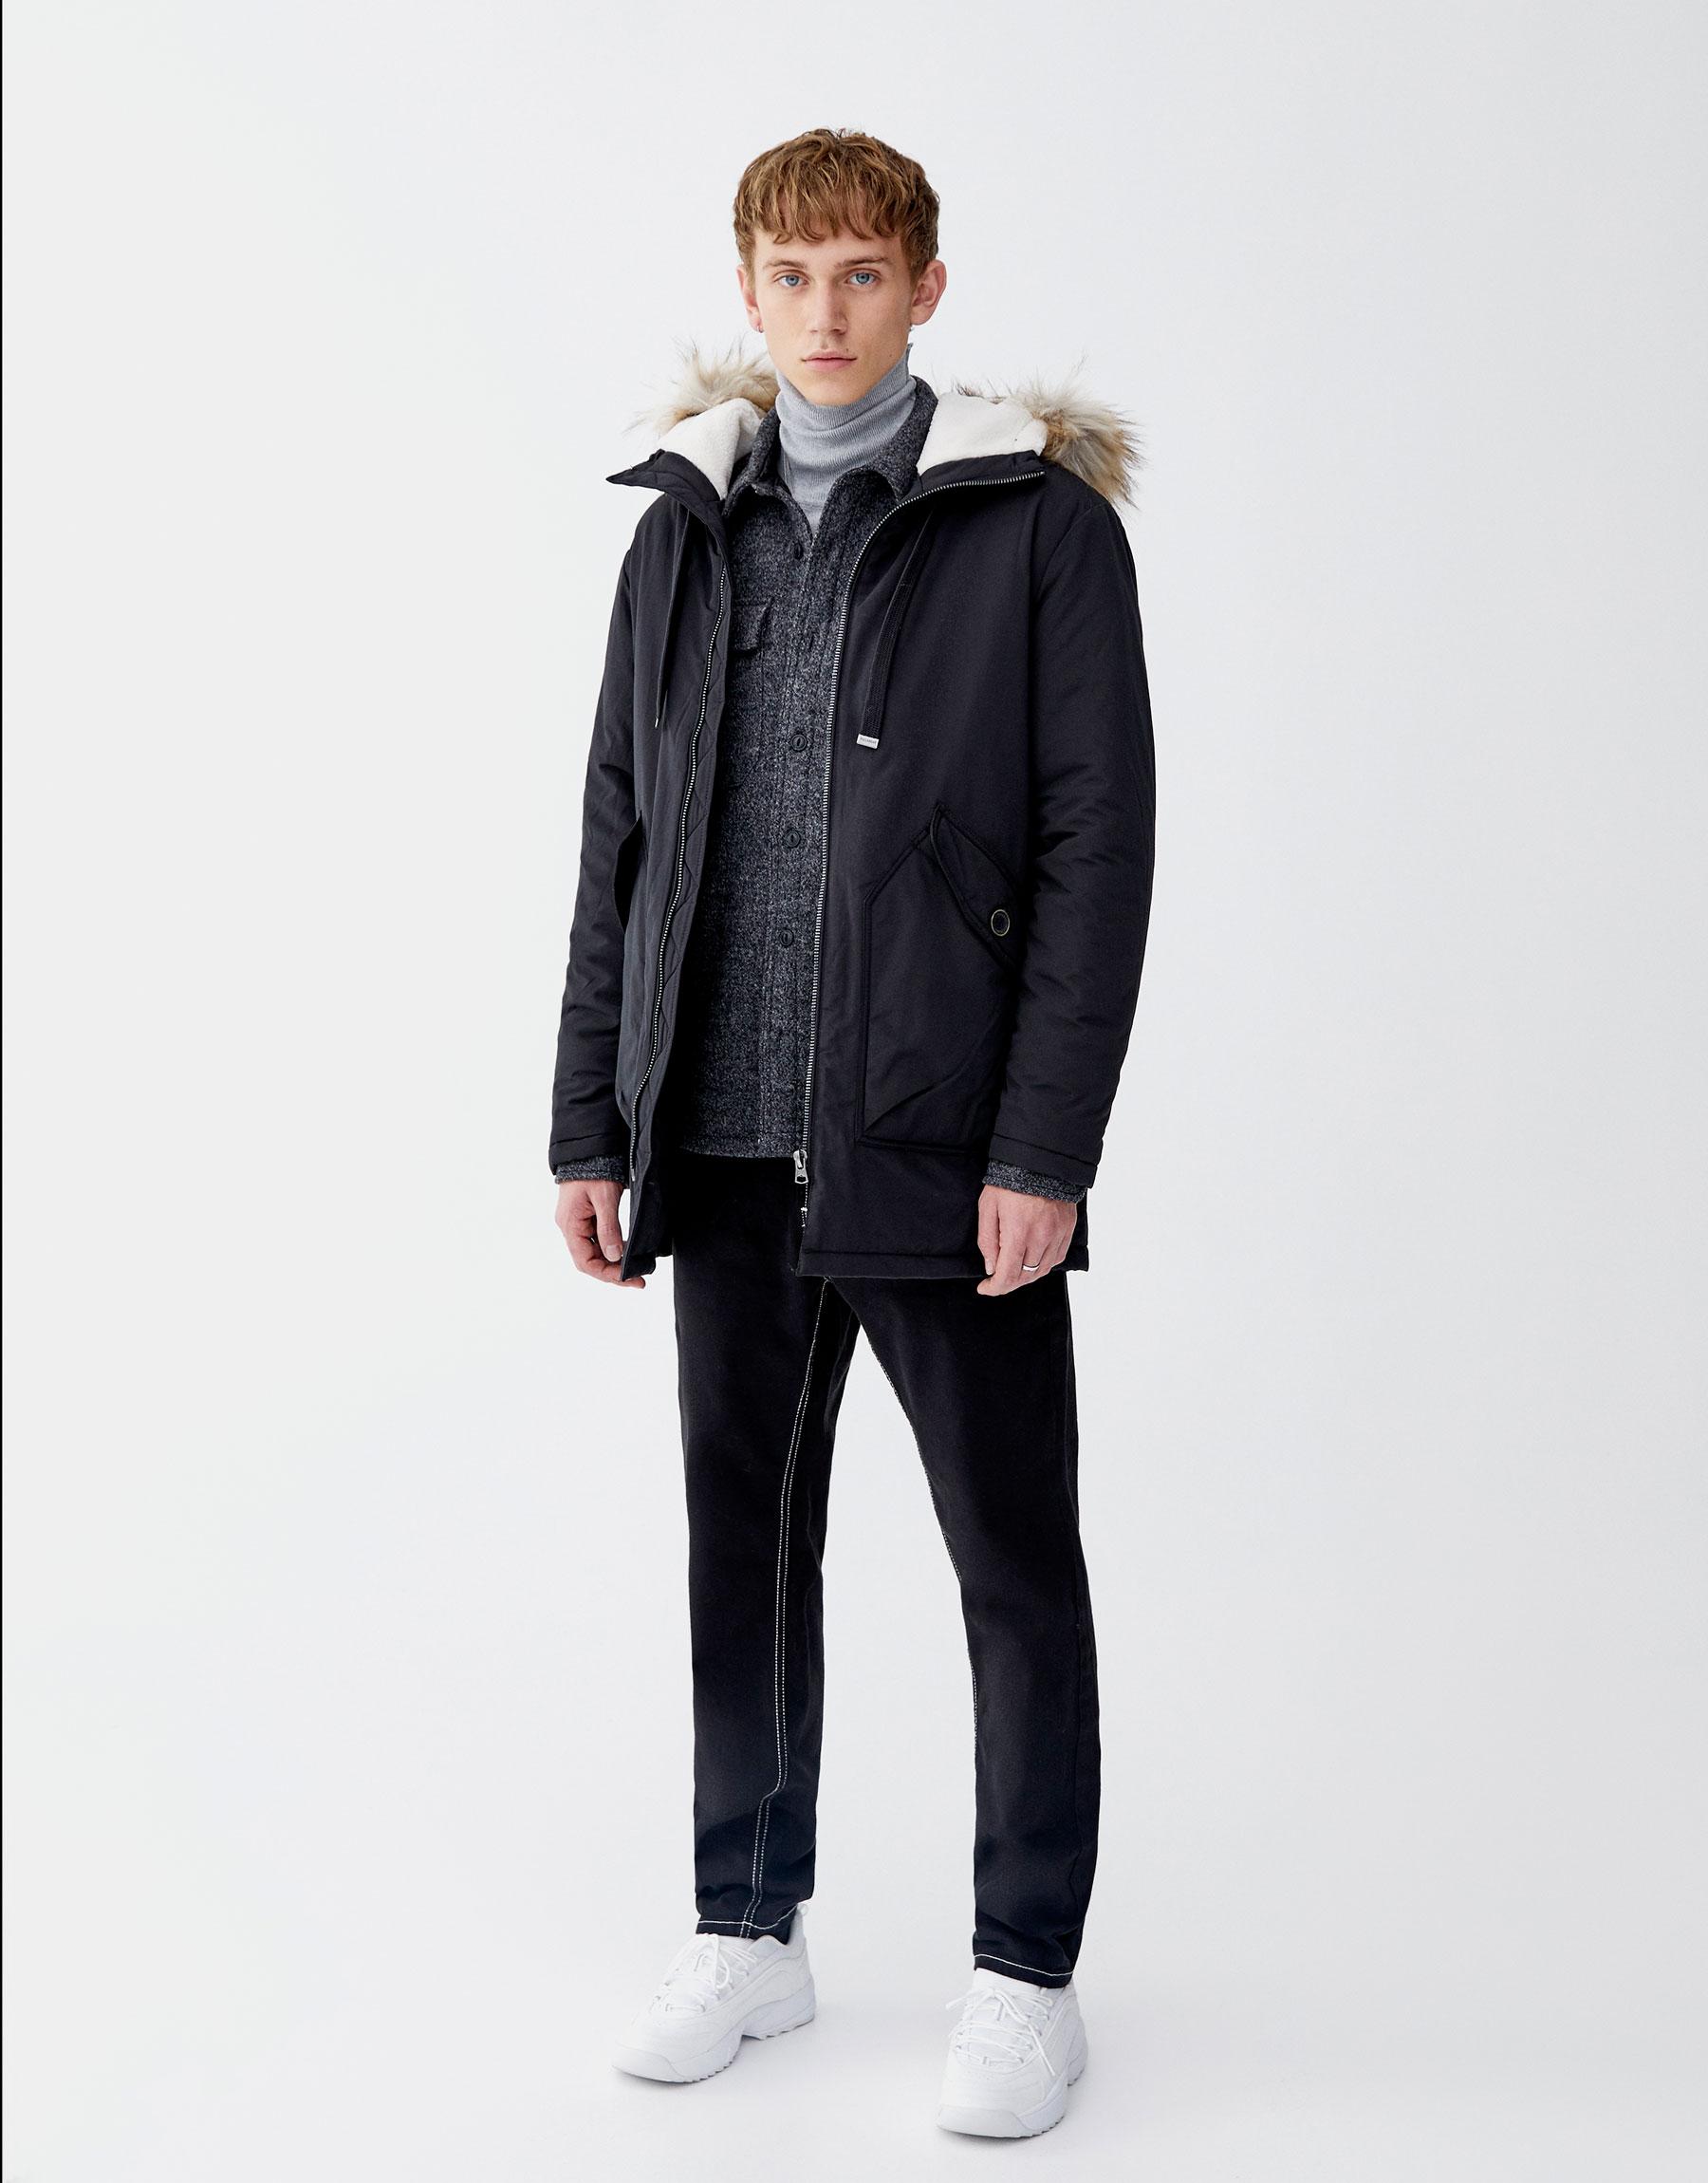 23 casacos para o frio que aí vem e o mais barato custa 6,5 euros